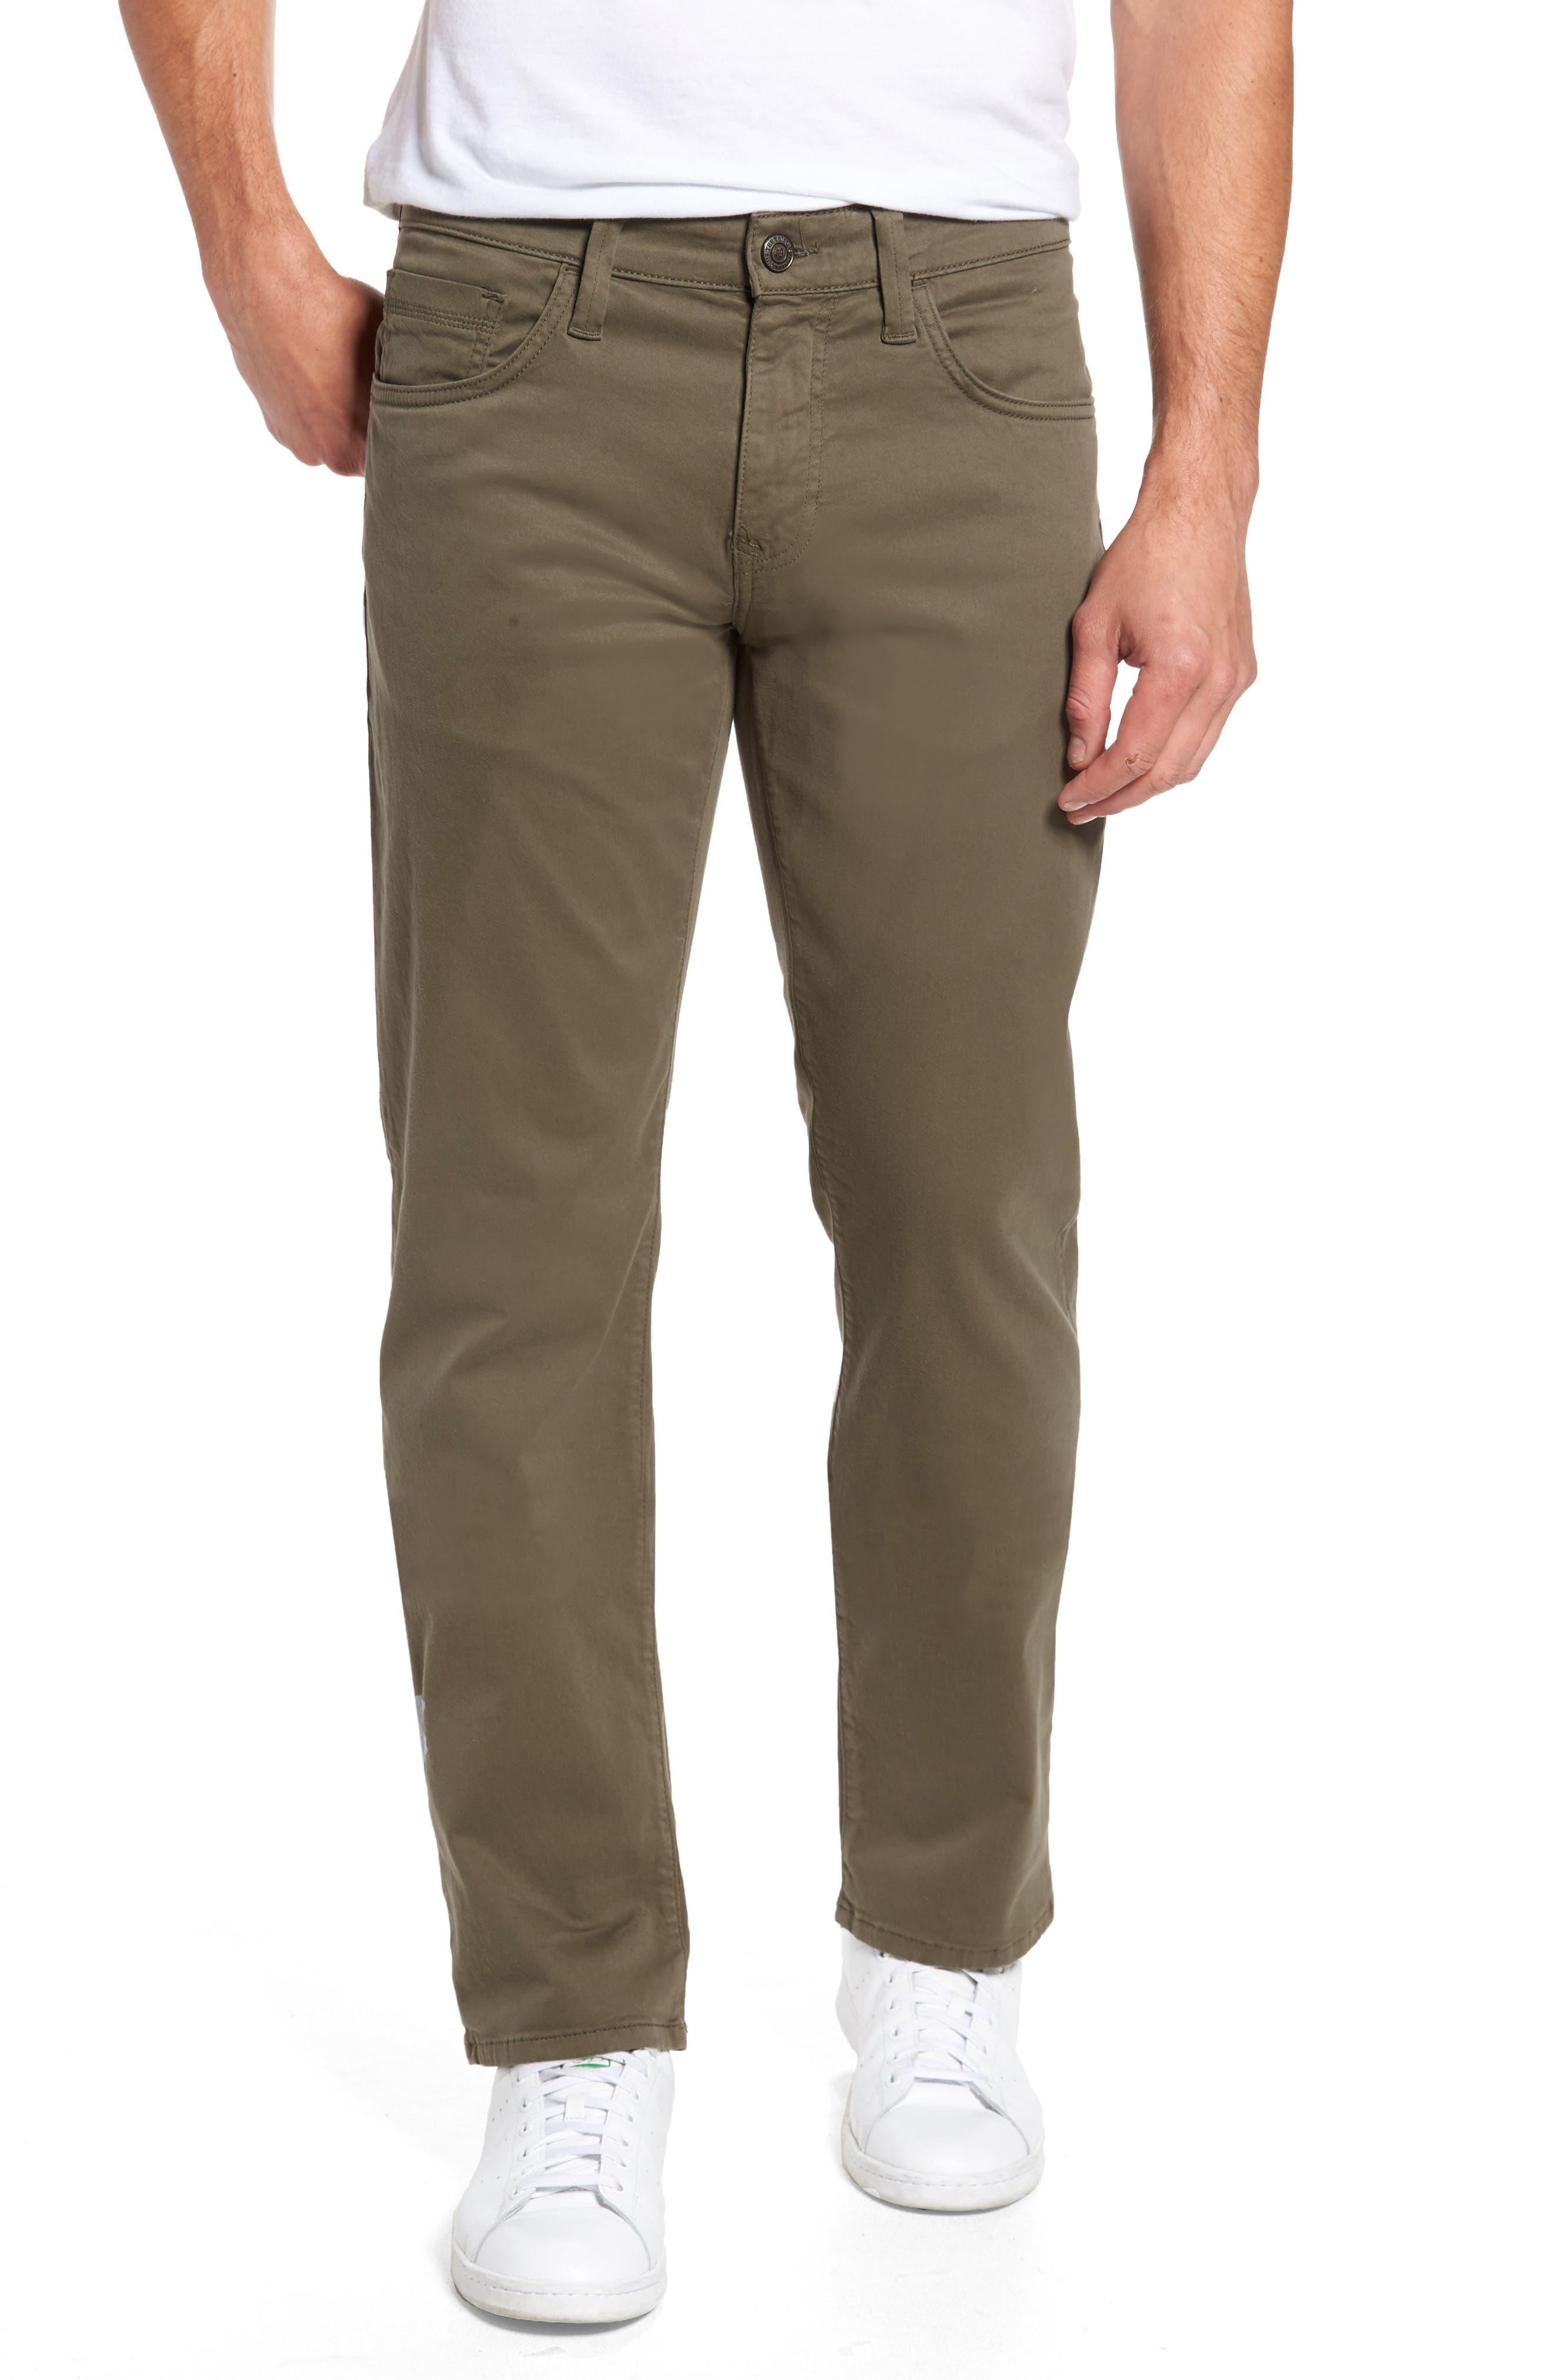 Men's Mavi Jeans Zach Straight Leg Twill Pants,  28 x 30 - Green